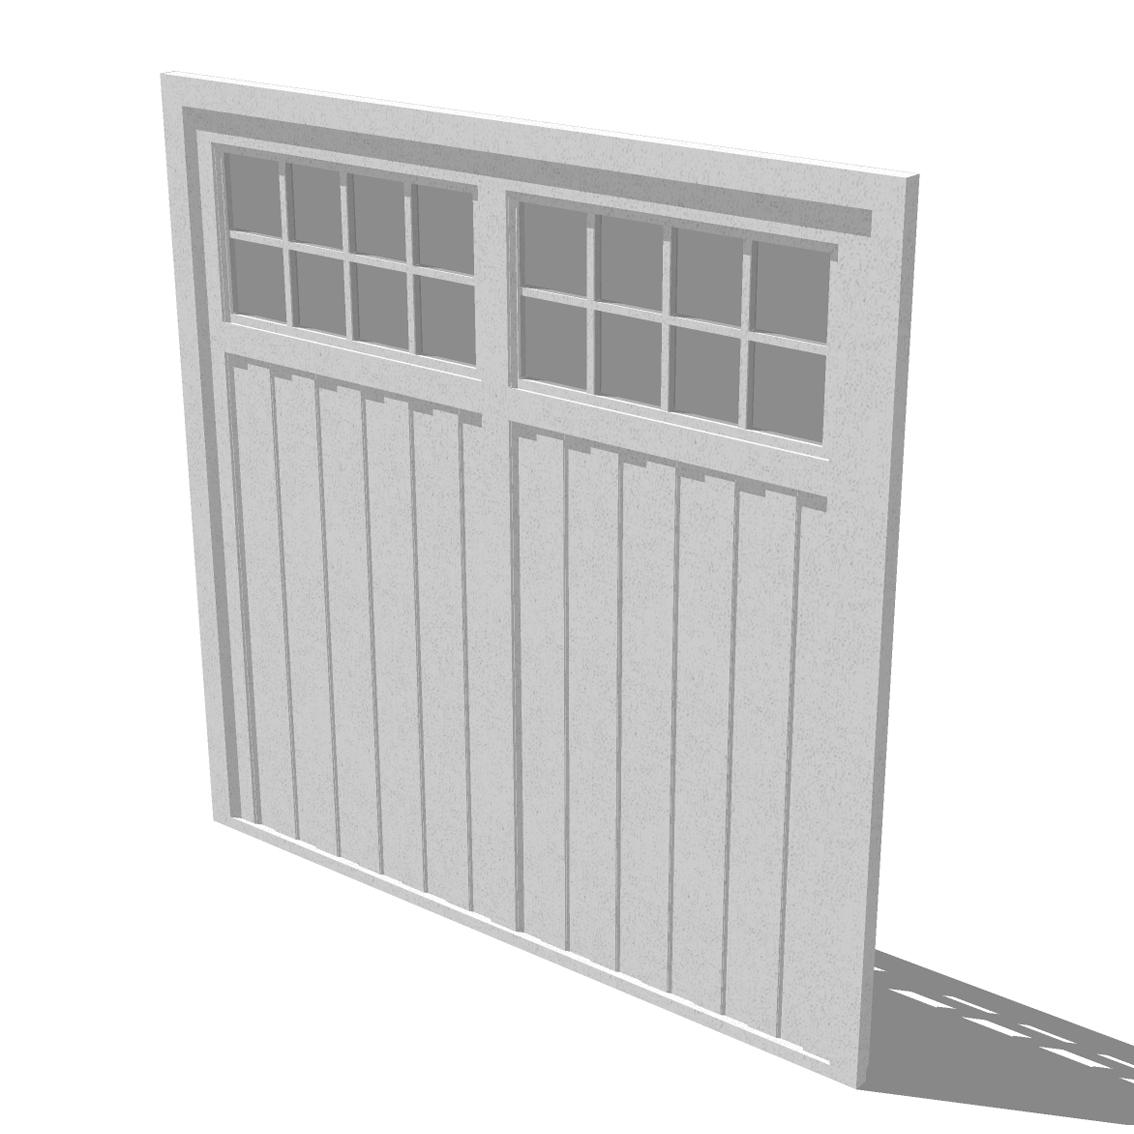 Revit garage door ppi blog barratt homes standard garage door model rubansaba